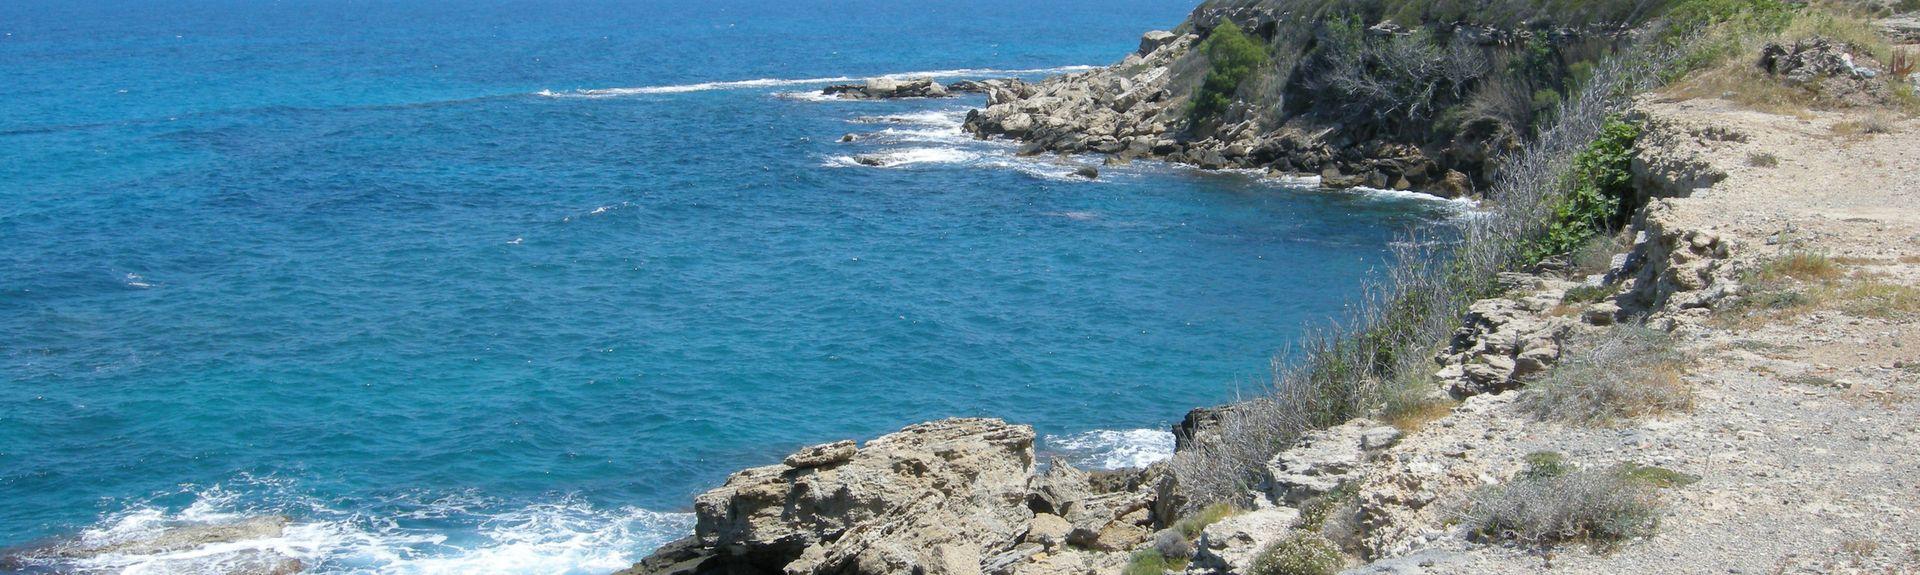 Tatlısu, Famagusta District, Cyprus